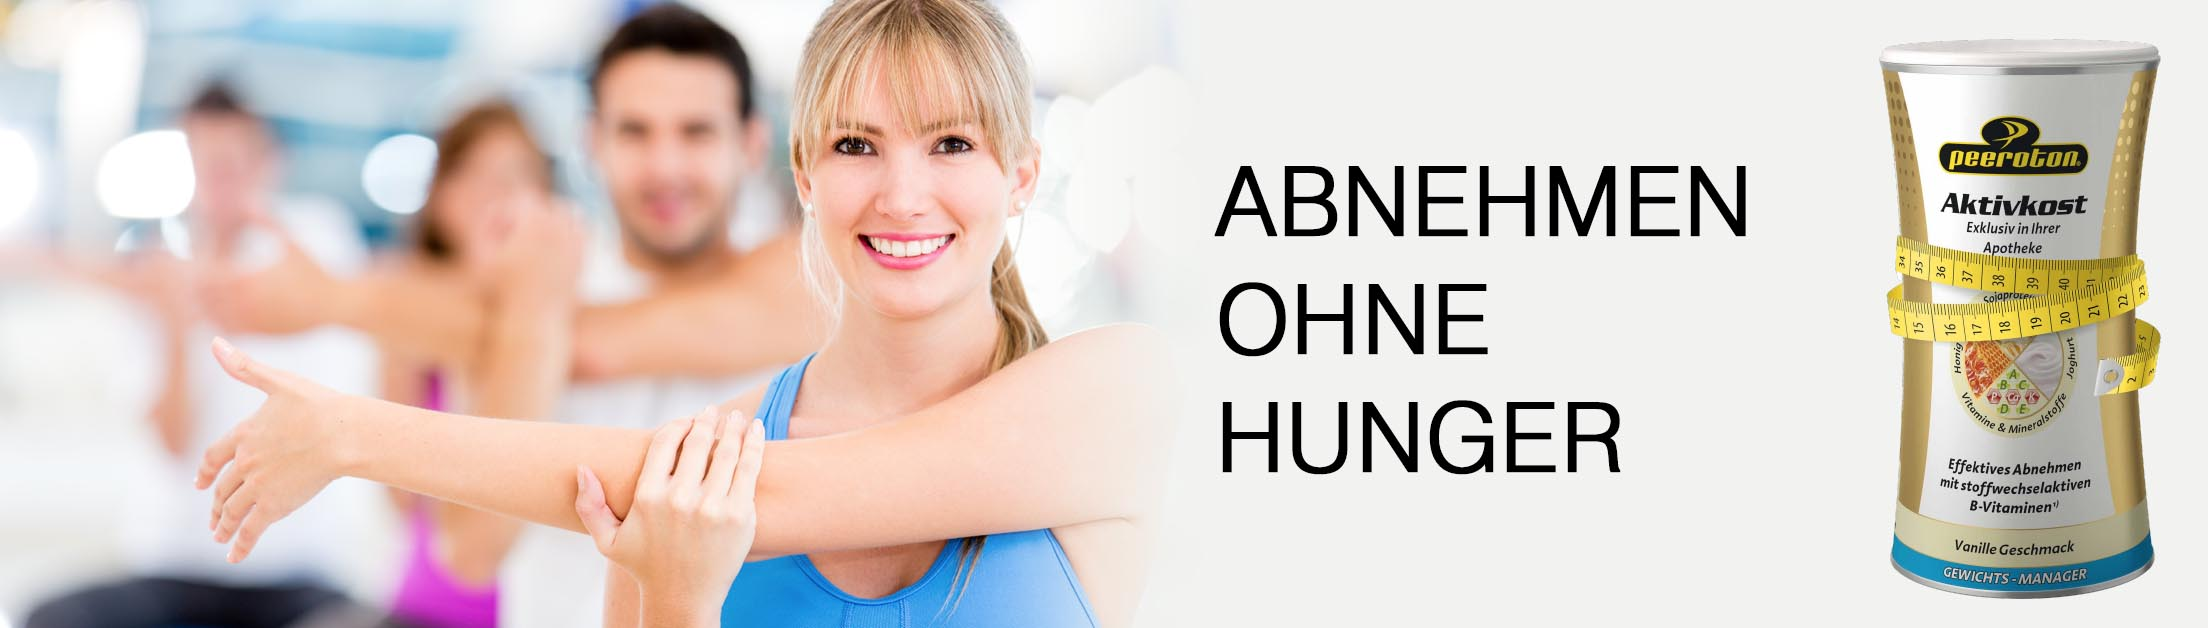 Abnehmen-ohne-Hunger-Slider-Blog